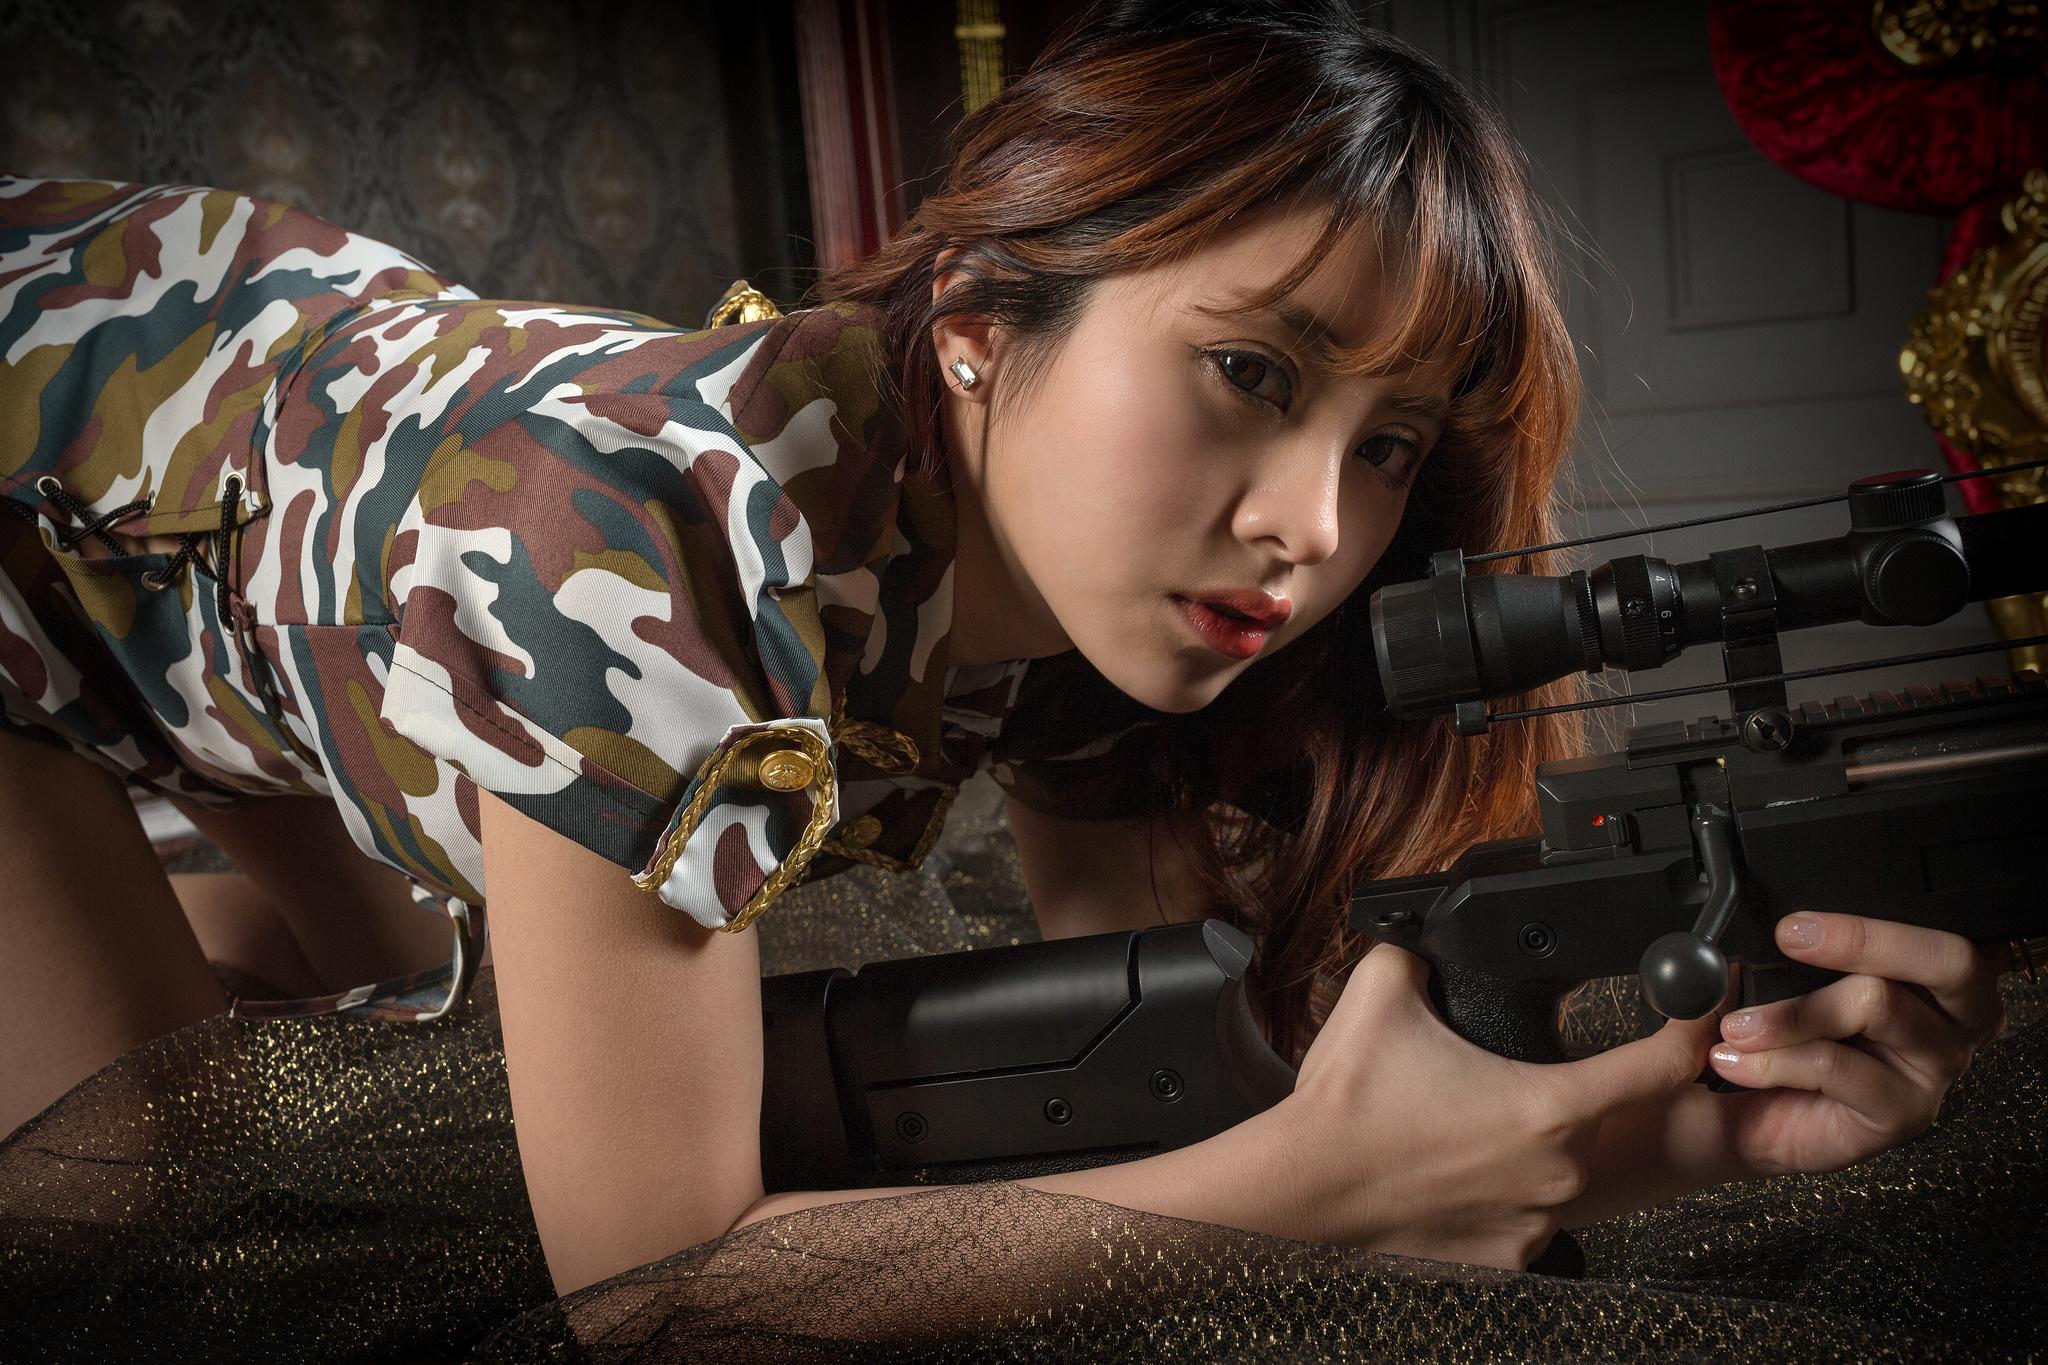 Asian military women naked, quarter midget track zellwood florida